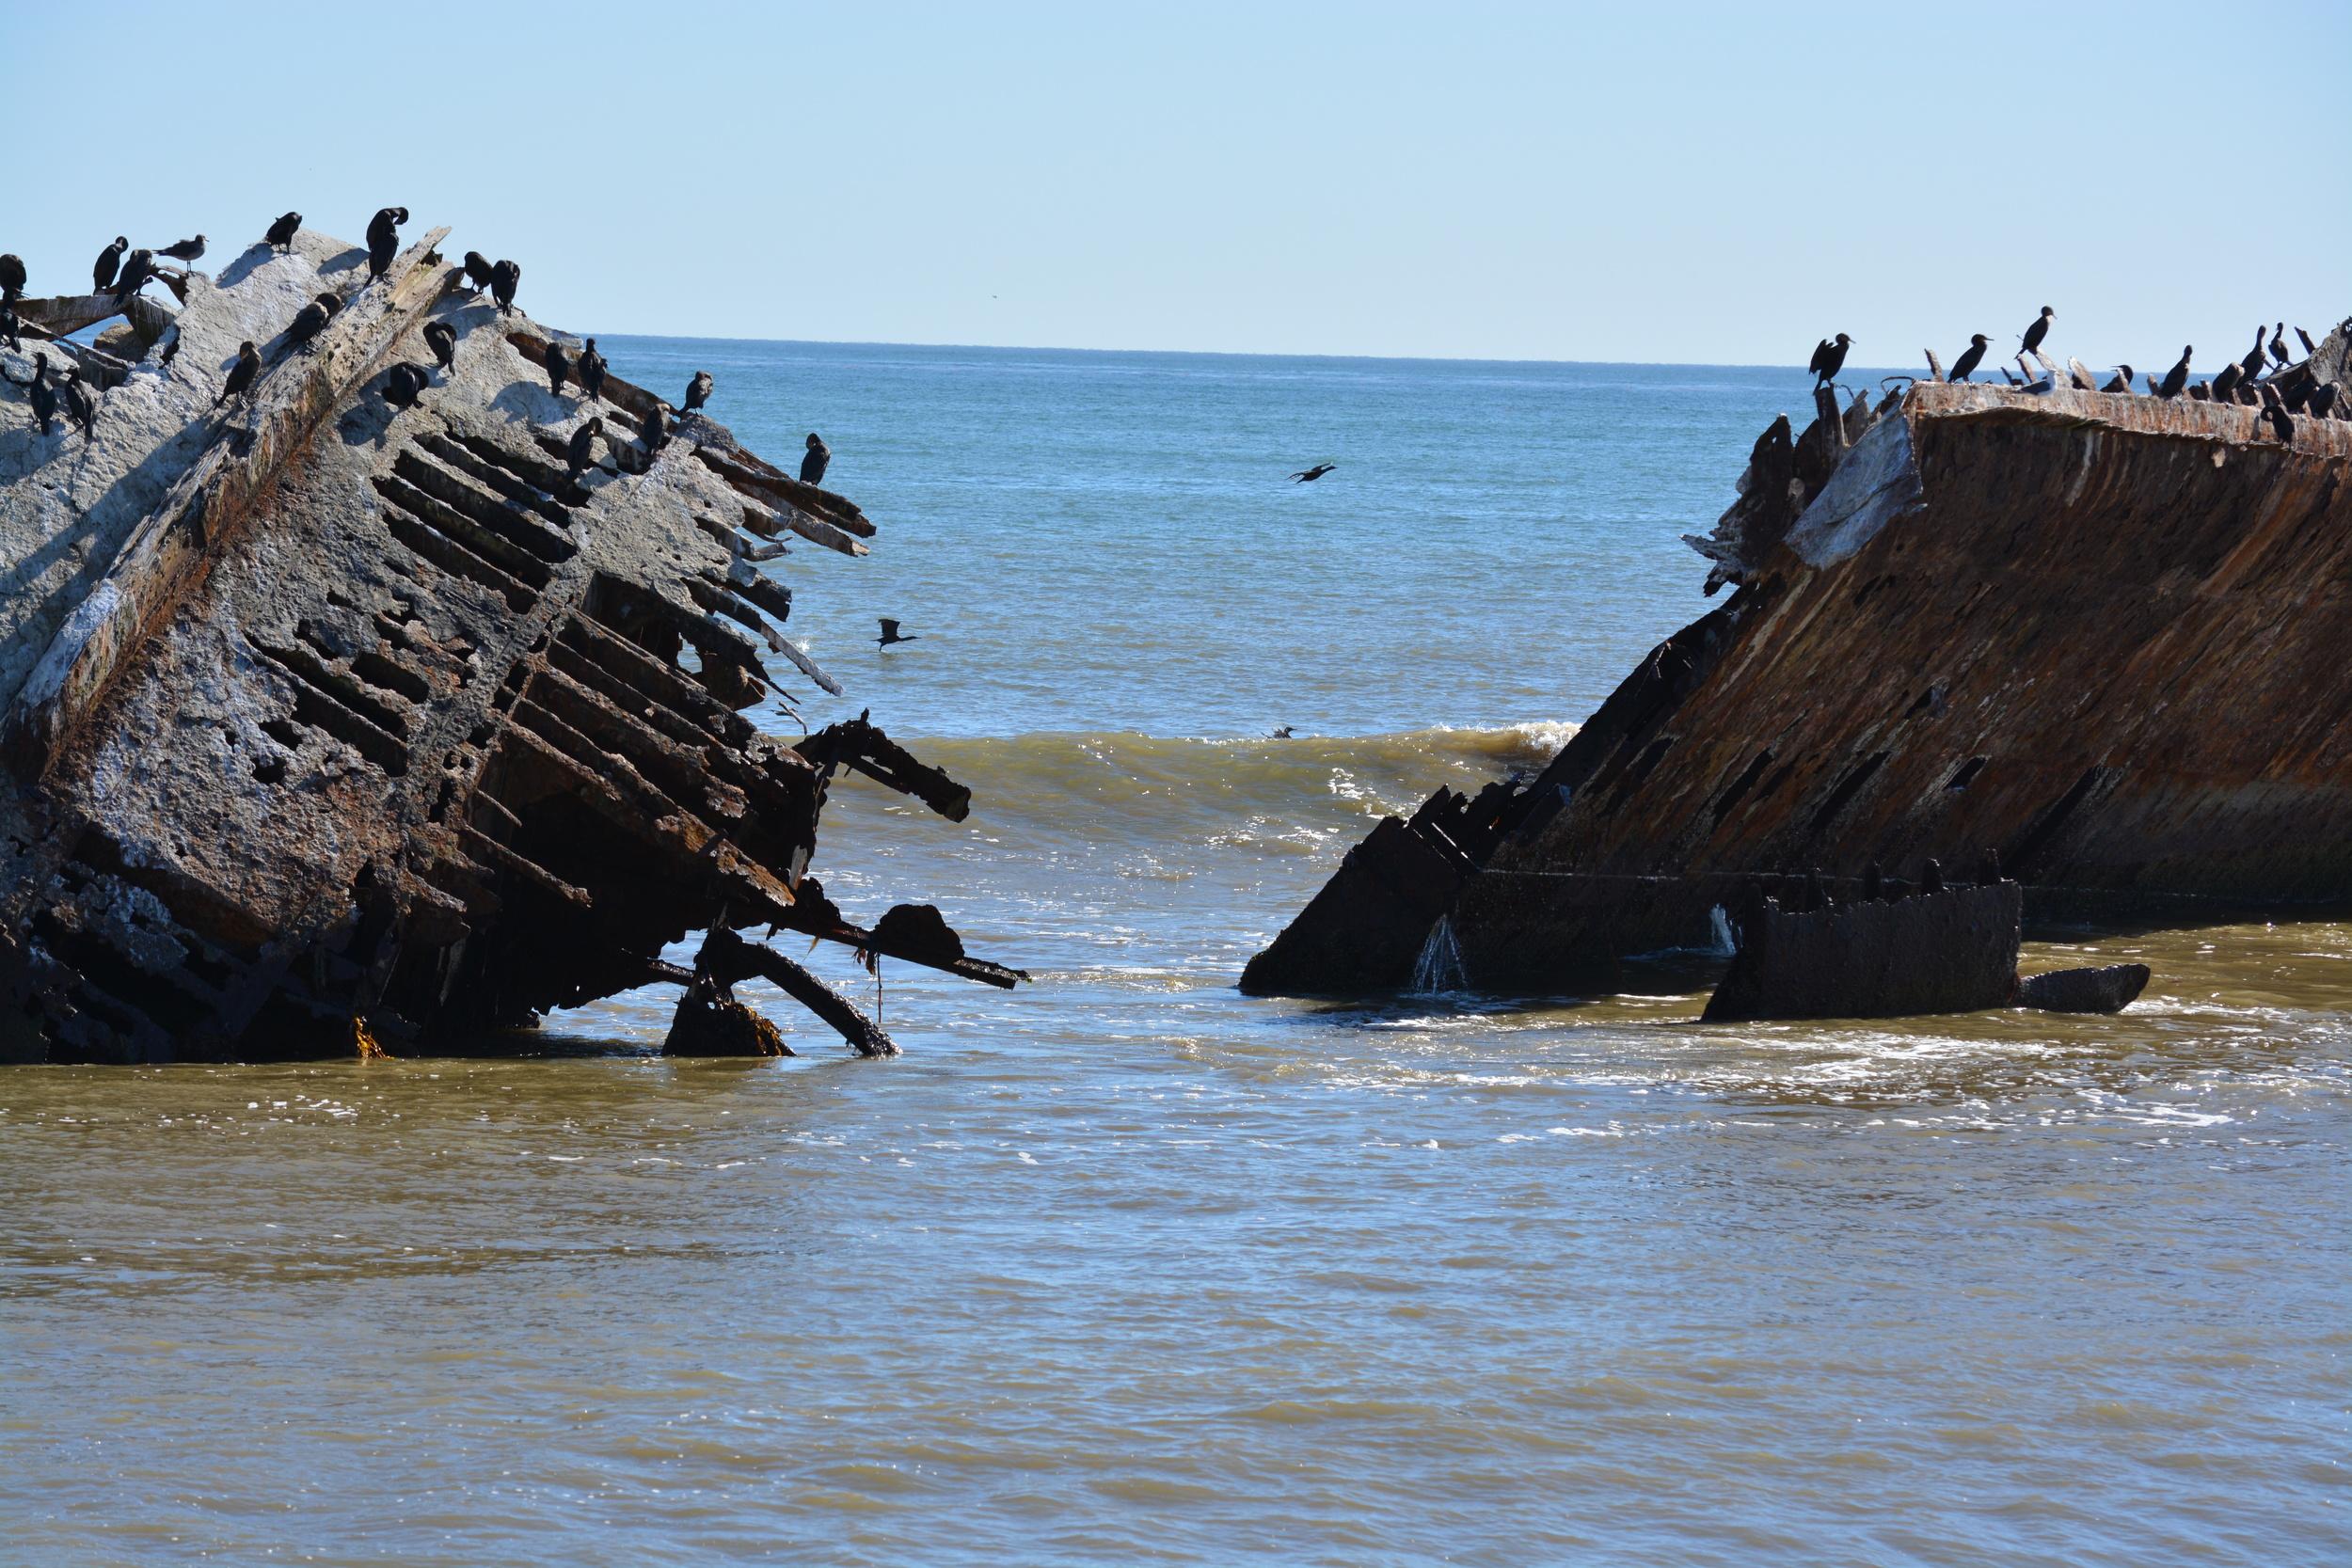 Baja California 10-5-13 Shipwrecks Surfing Adventure Ocean Experience Surf School San Diego (71).JPG